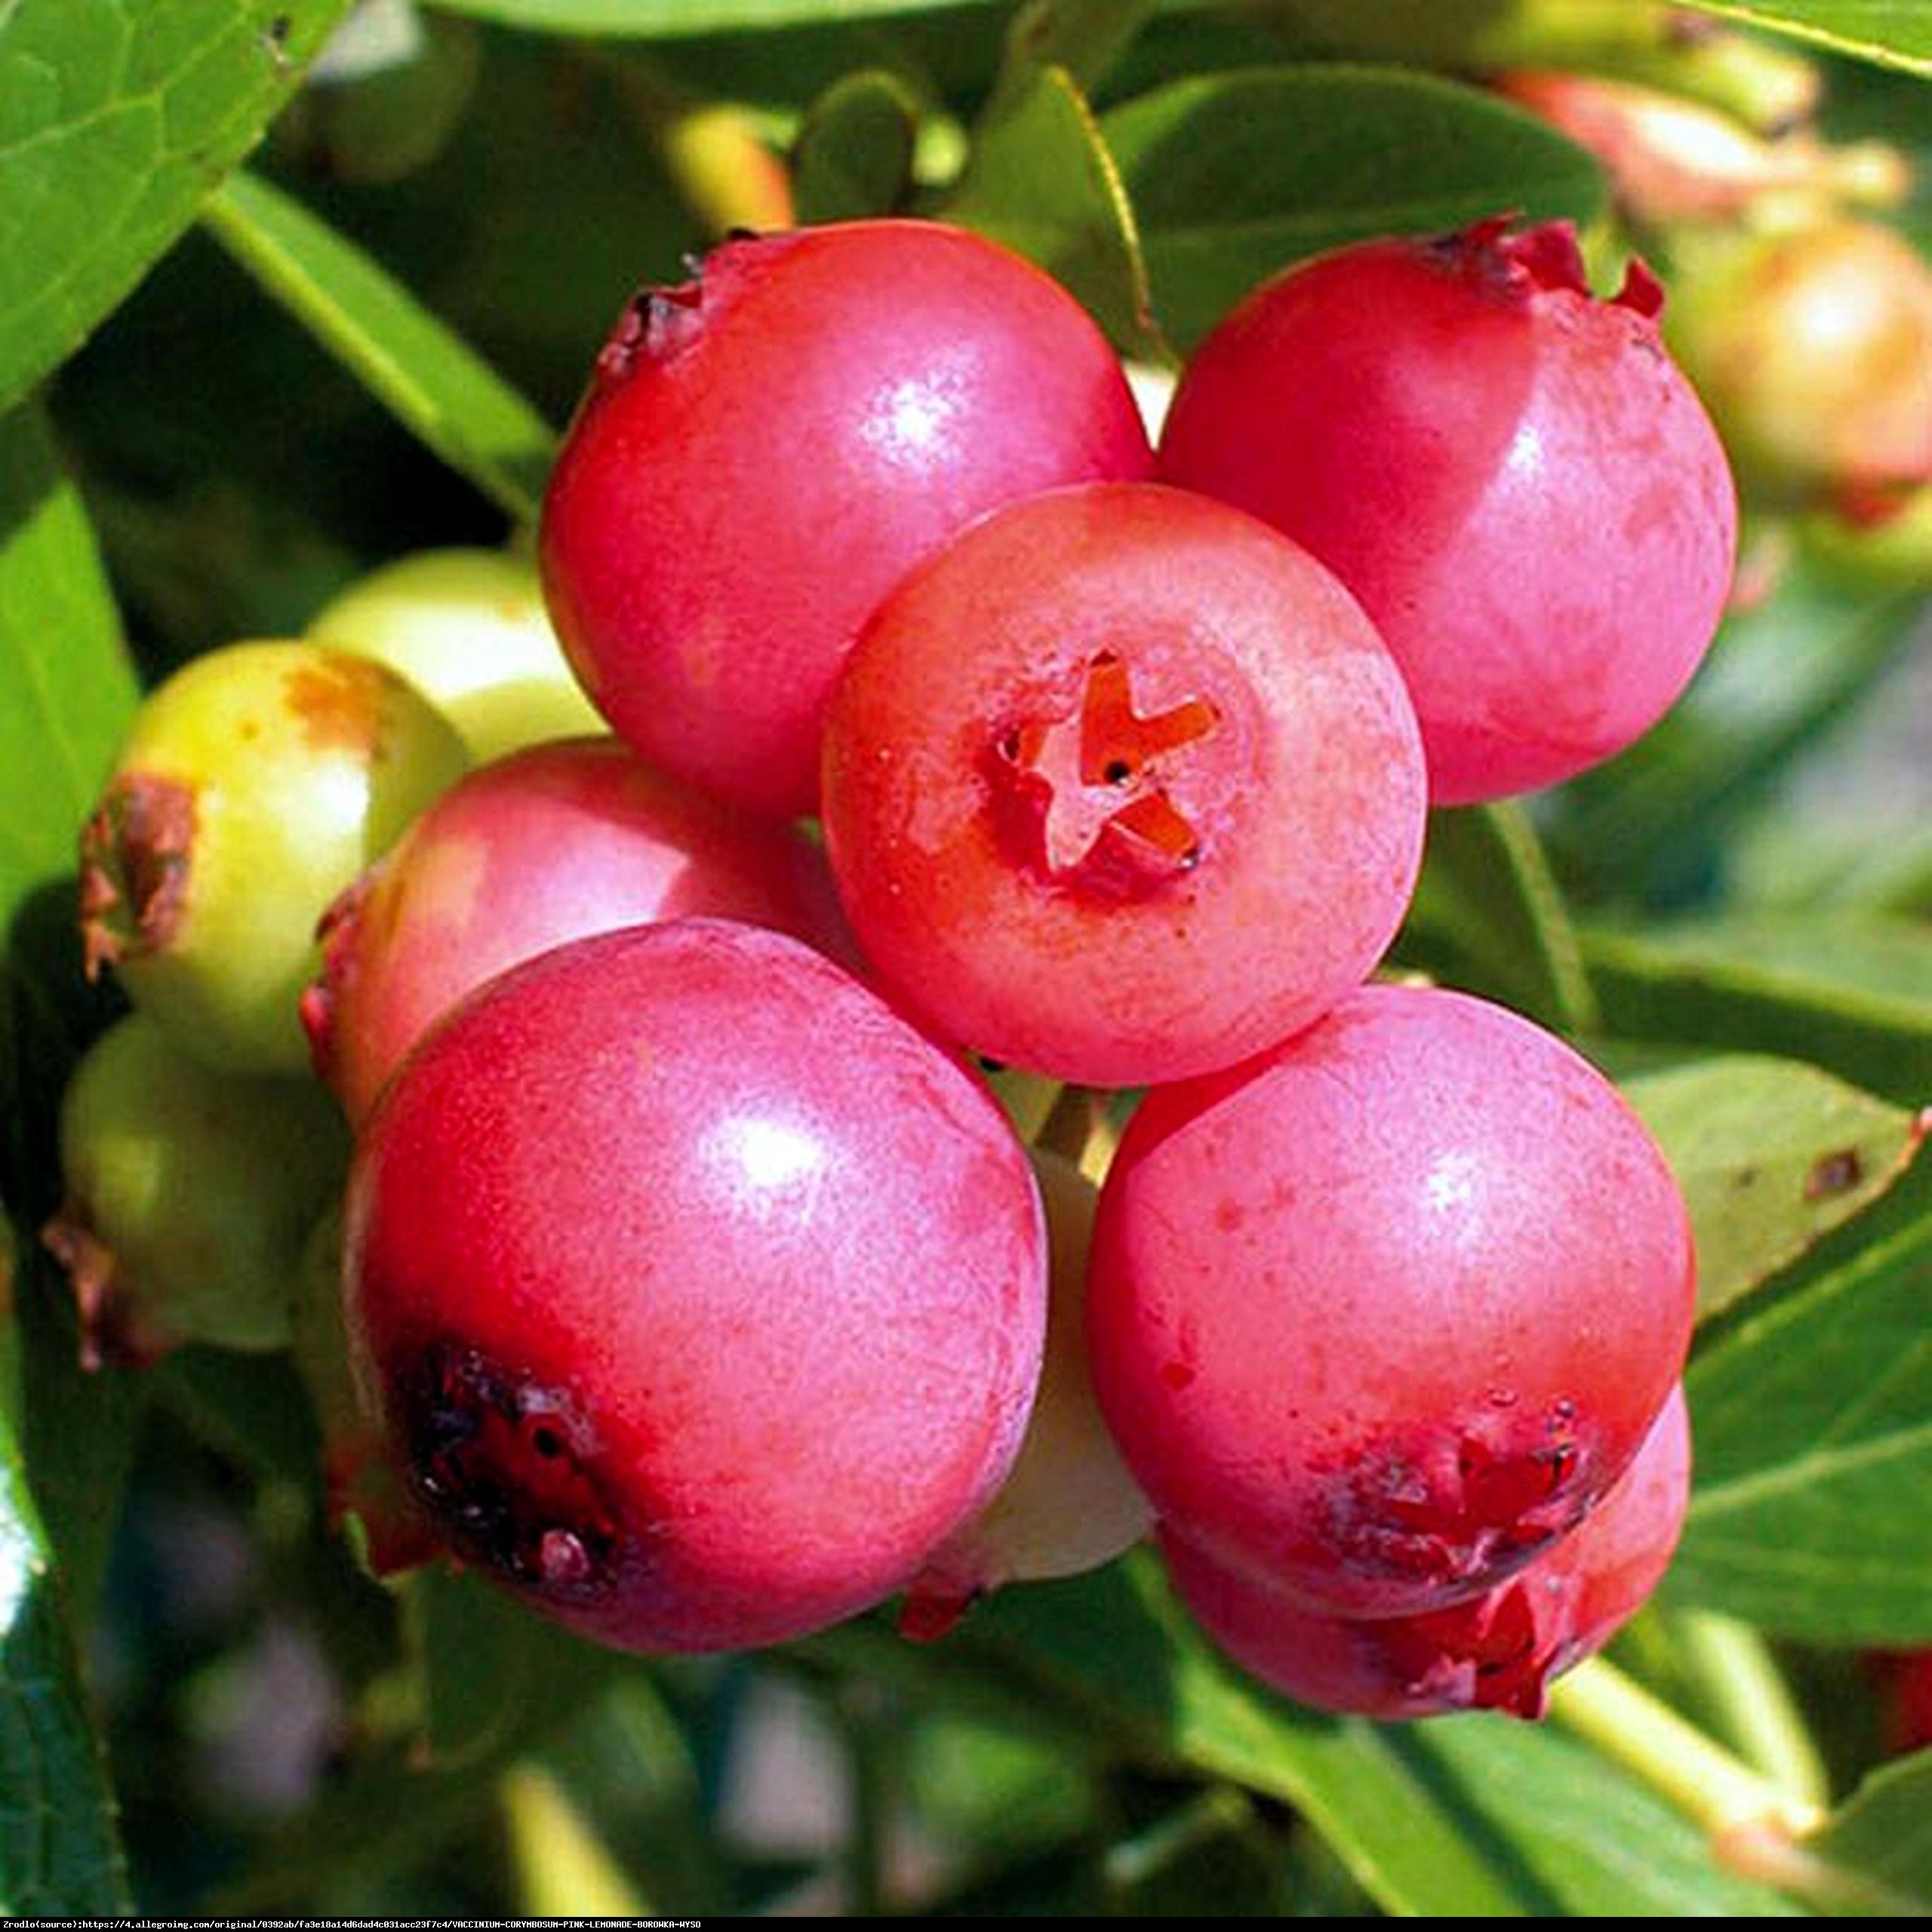 Borówka amerykańska Pink Lemonade 2 letnia - Vaccinium corymbosum Pink Lemonade